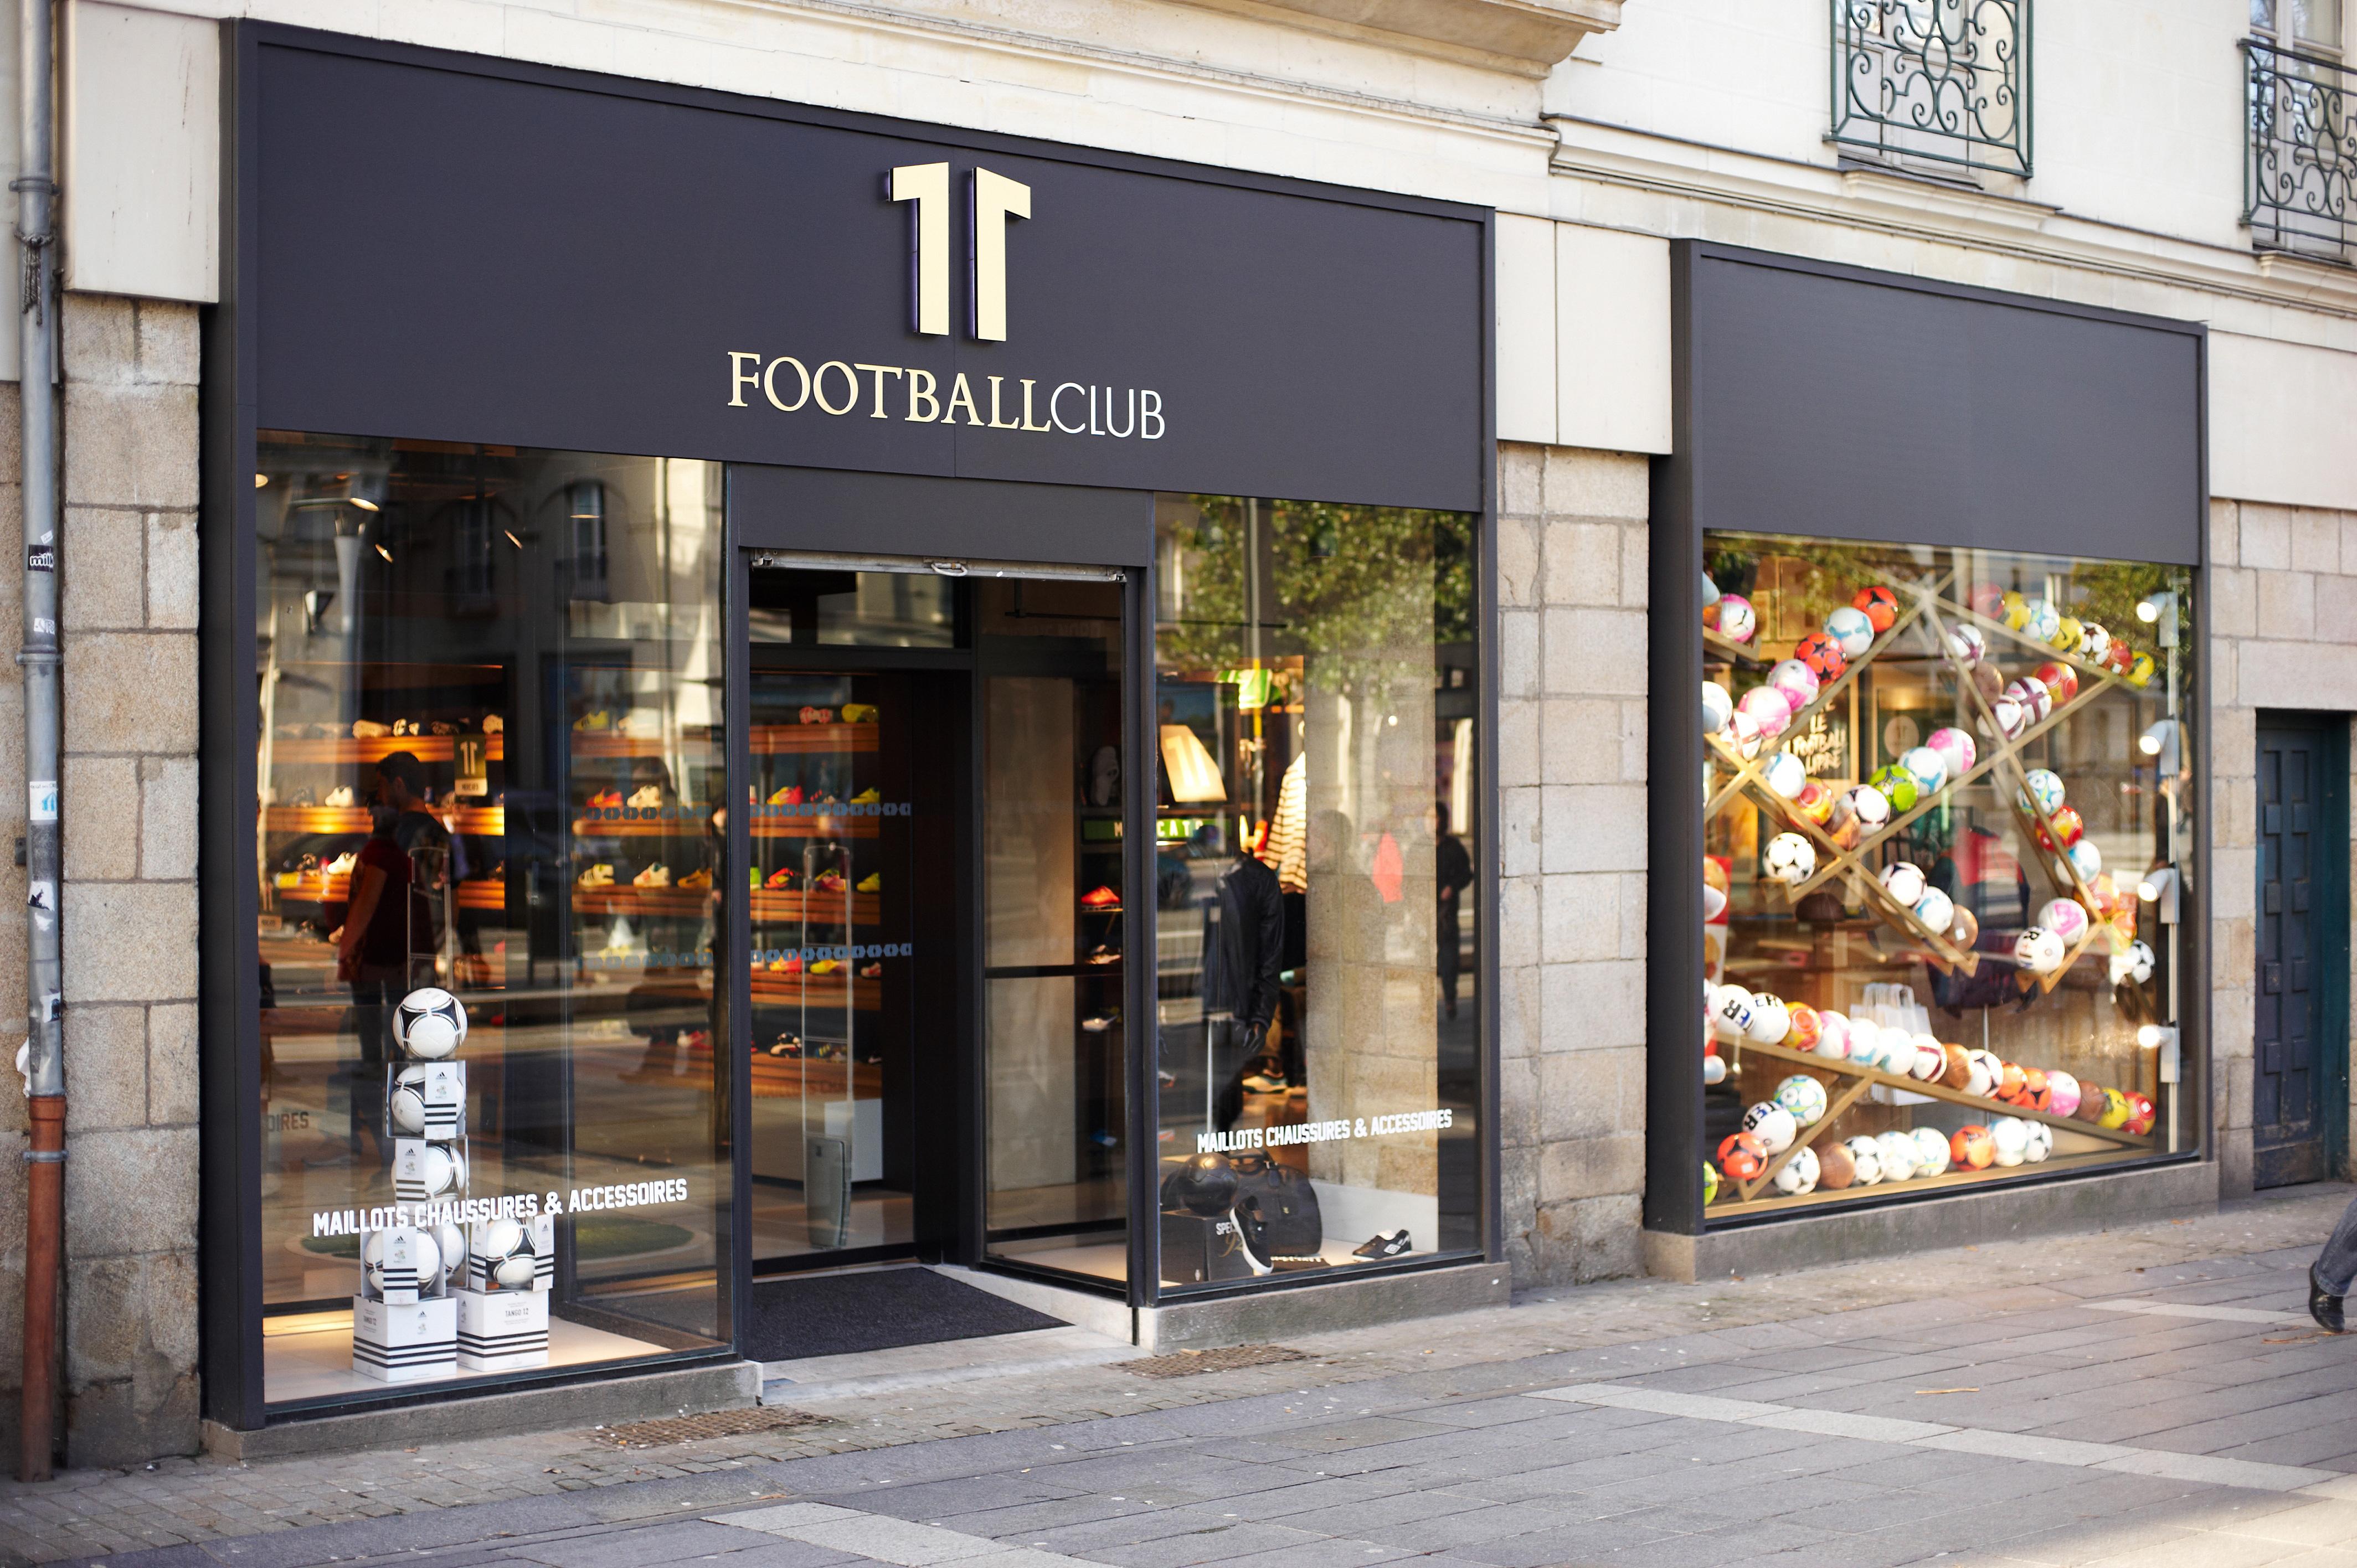 11footballclub vitrine